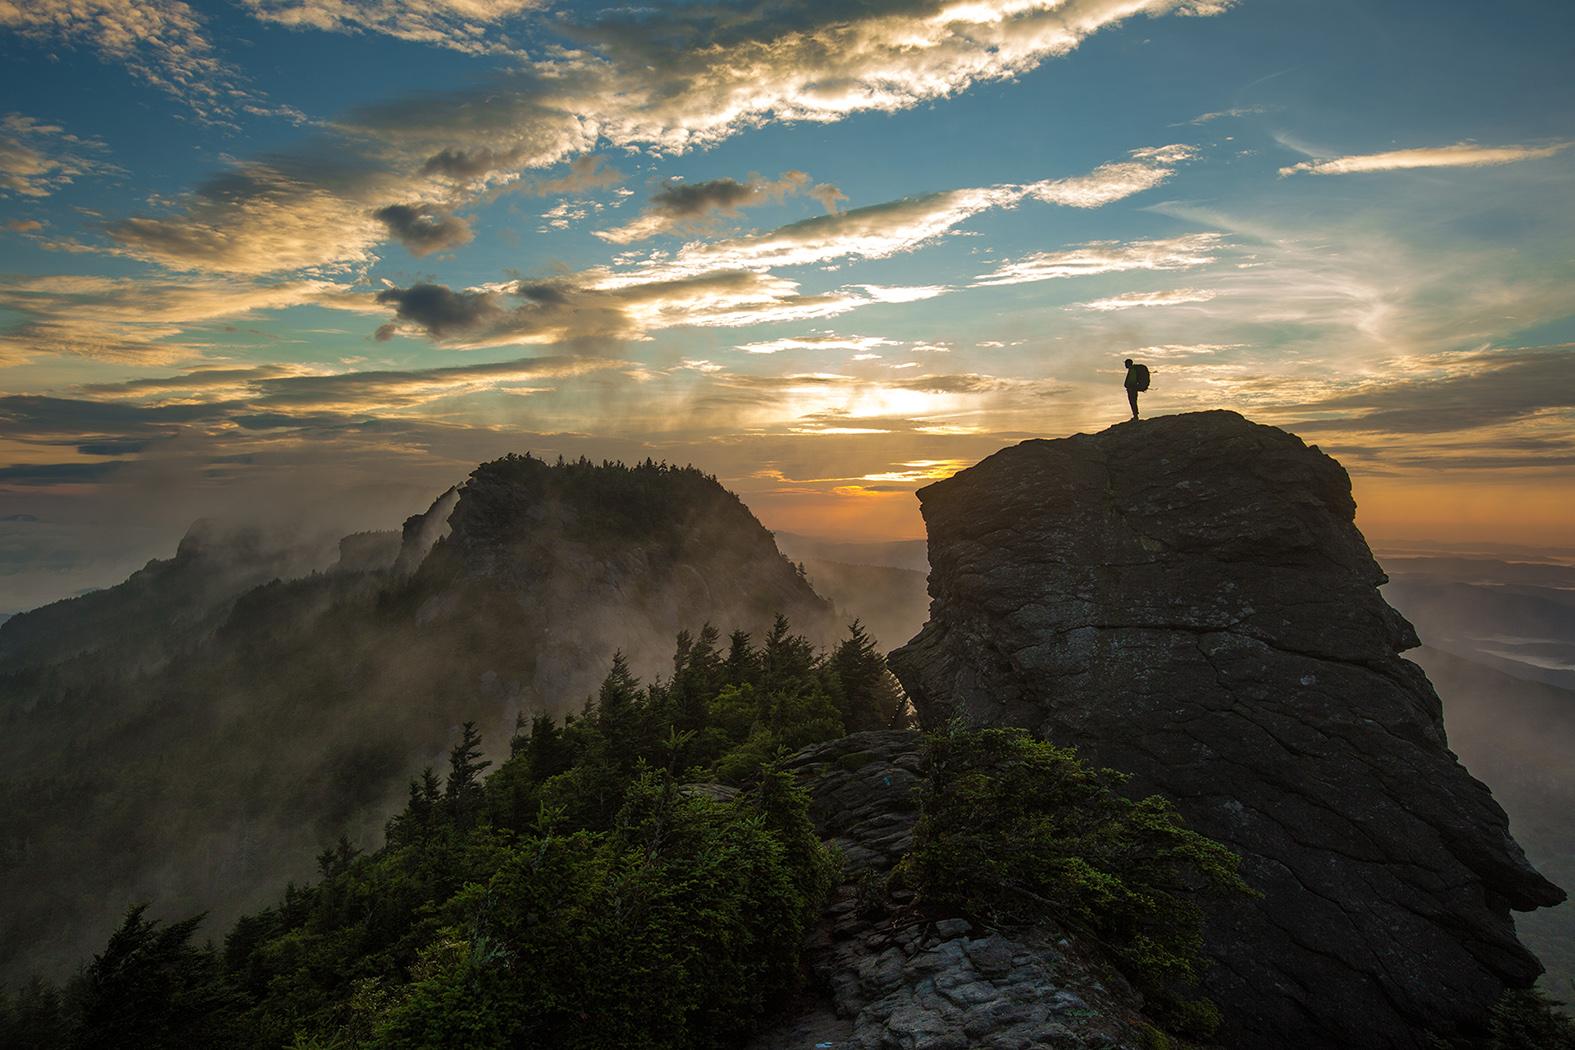 Caroline du Nord_Grandfather Mountain Sunrise with Hiker - Copie